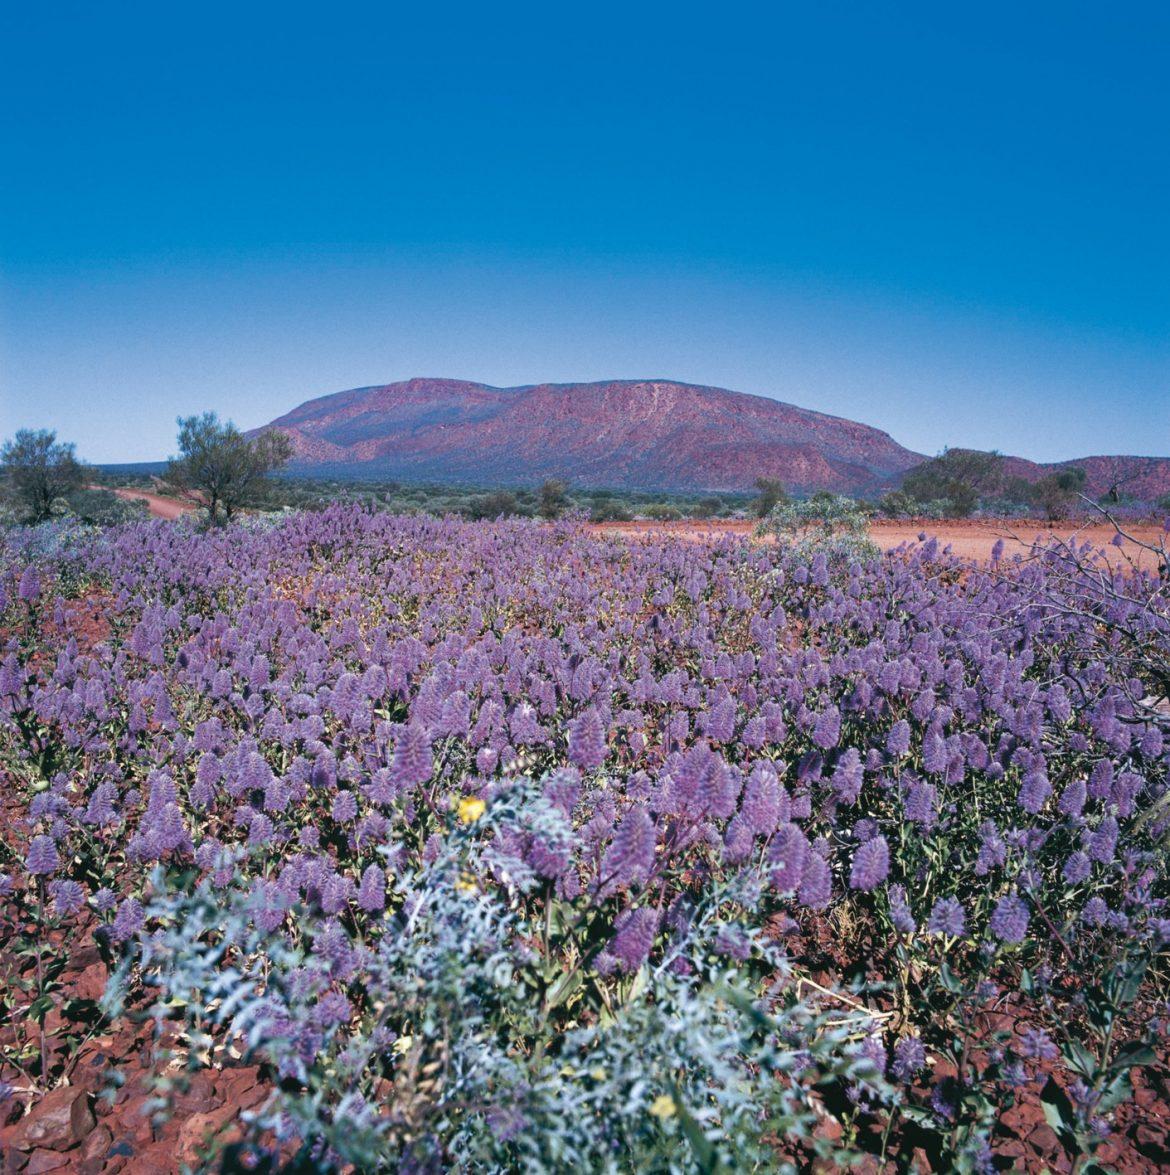 Wildflowers near Karijini National Park